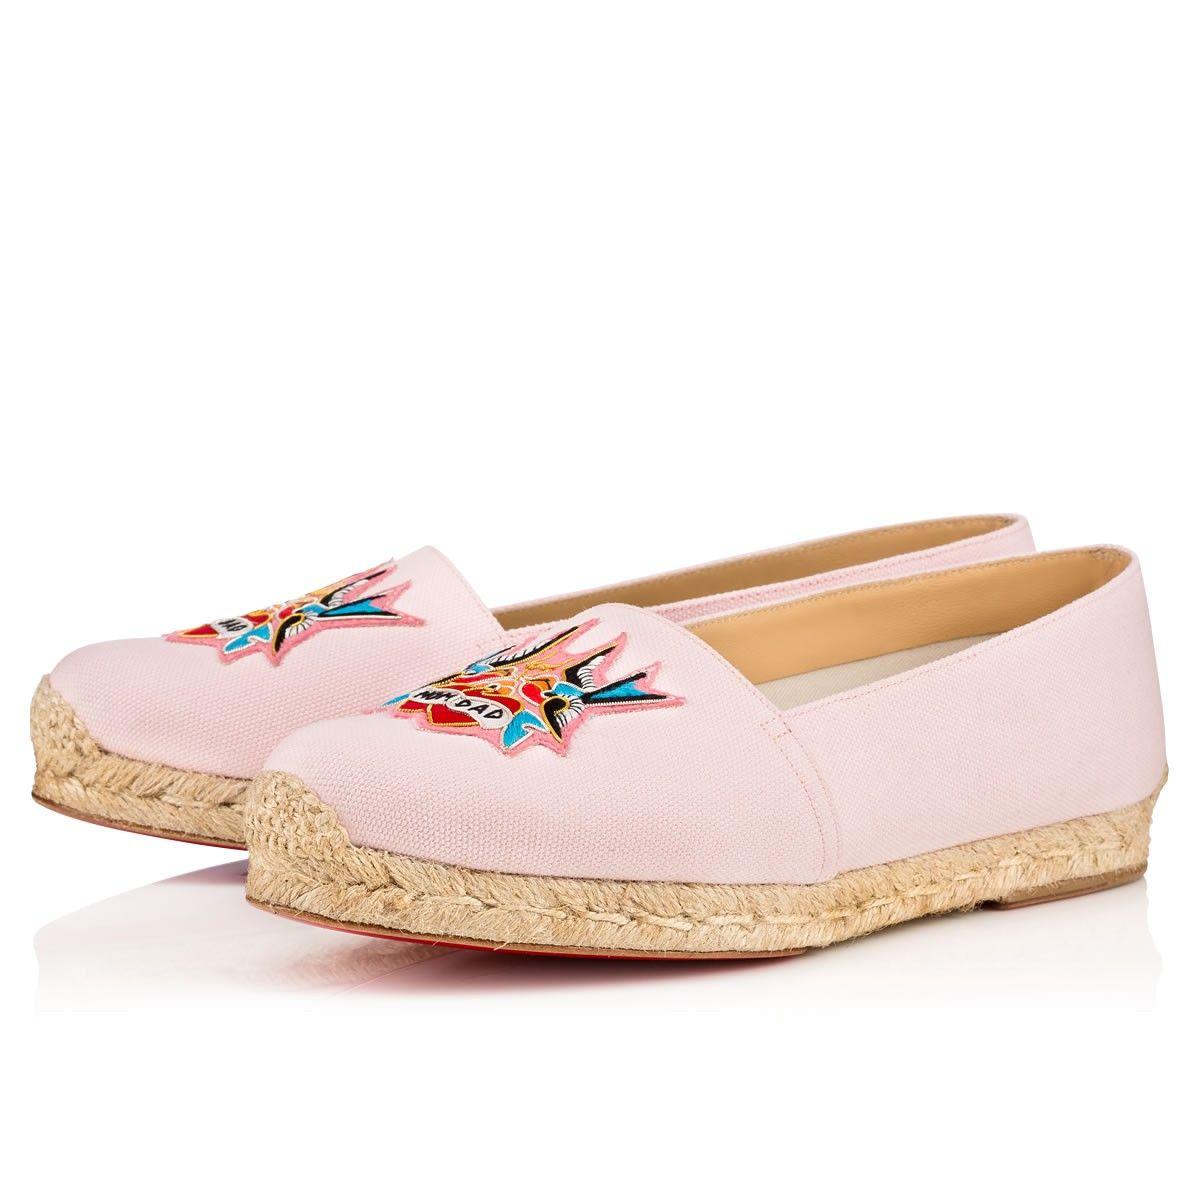 CHRISTIAN LOUBOUTIN. Mom And DadWomens FlatsCanvasChristian LouboutinWoman  ShoesMarvel ...